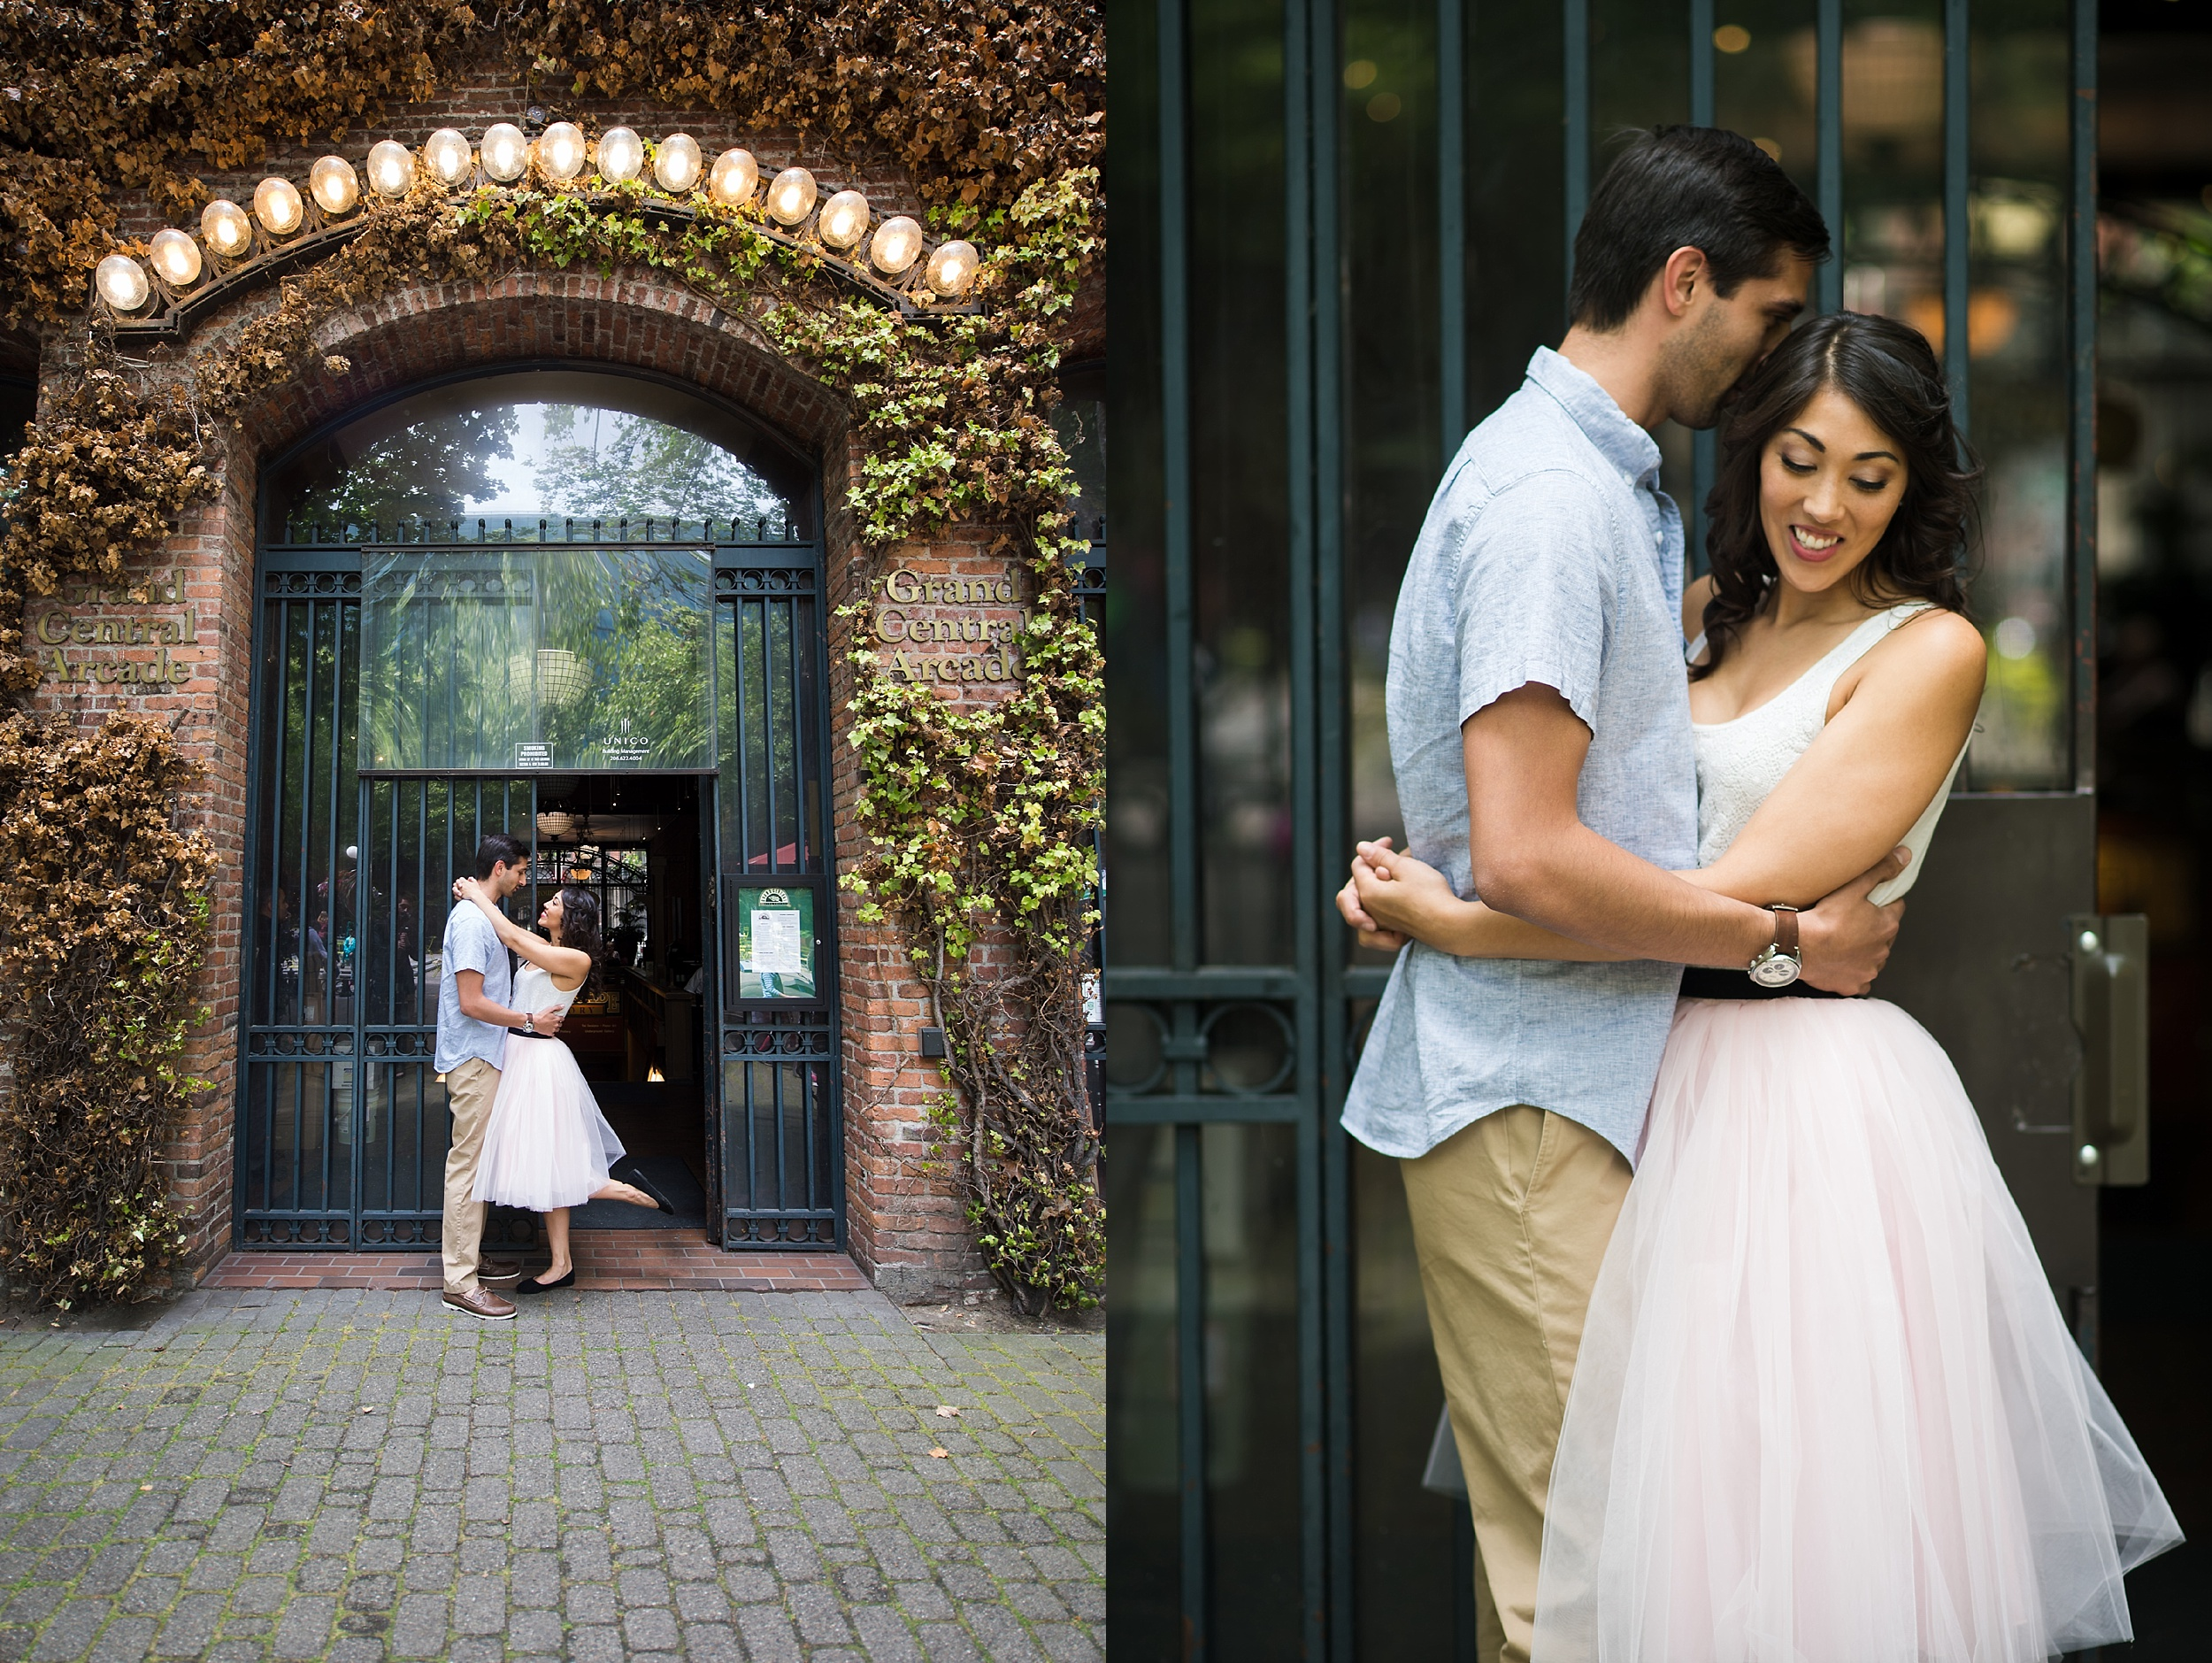 lockandco-virginia-dc-maryland-weddings-portraits-engagements_0008.jpg